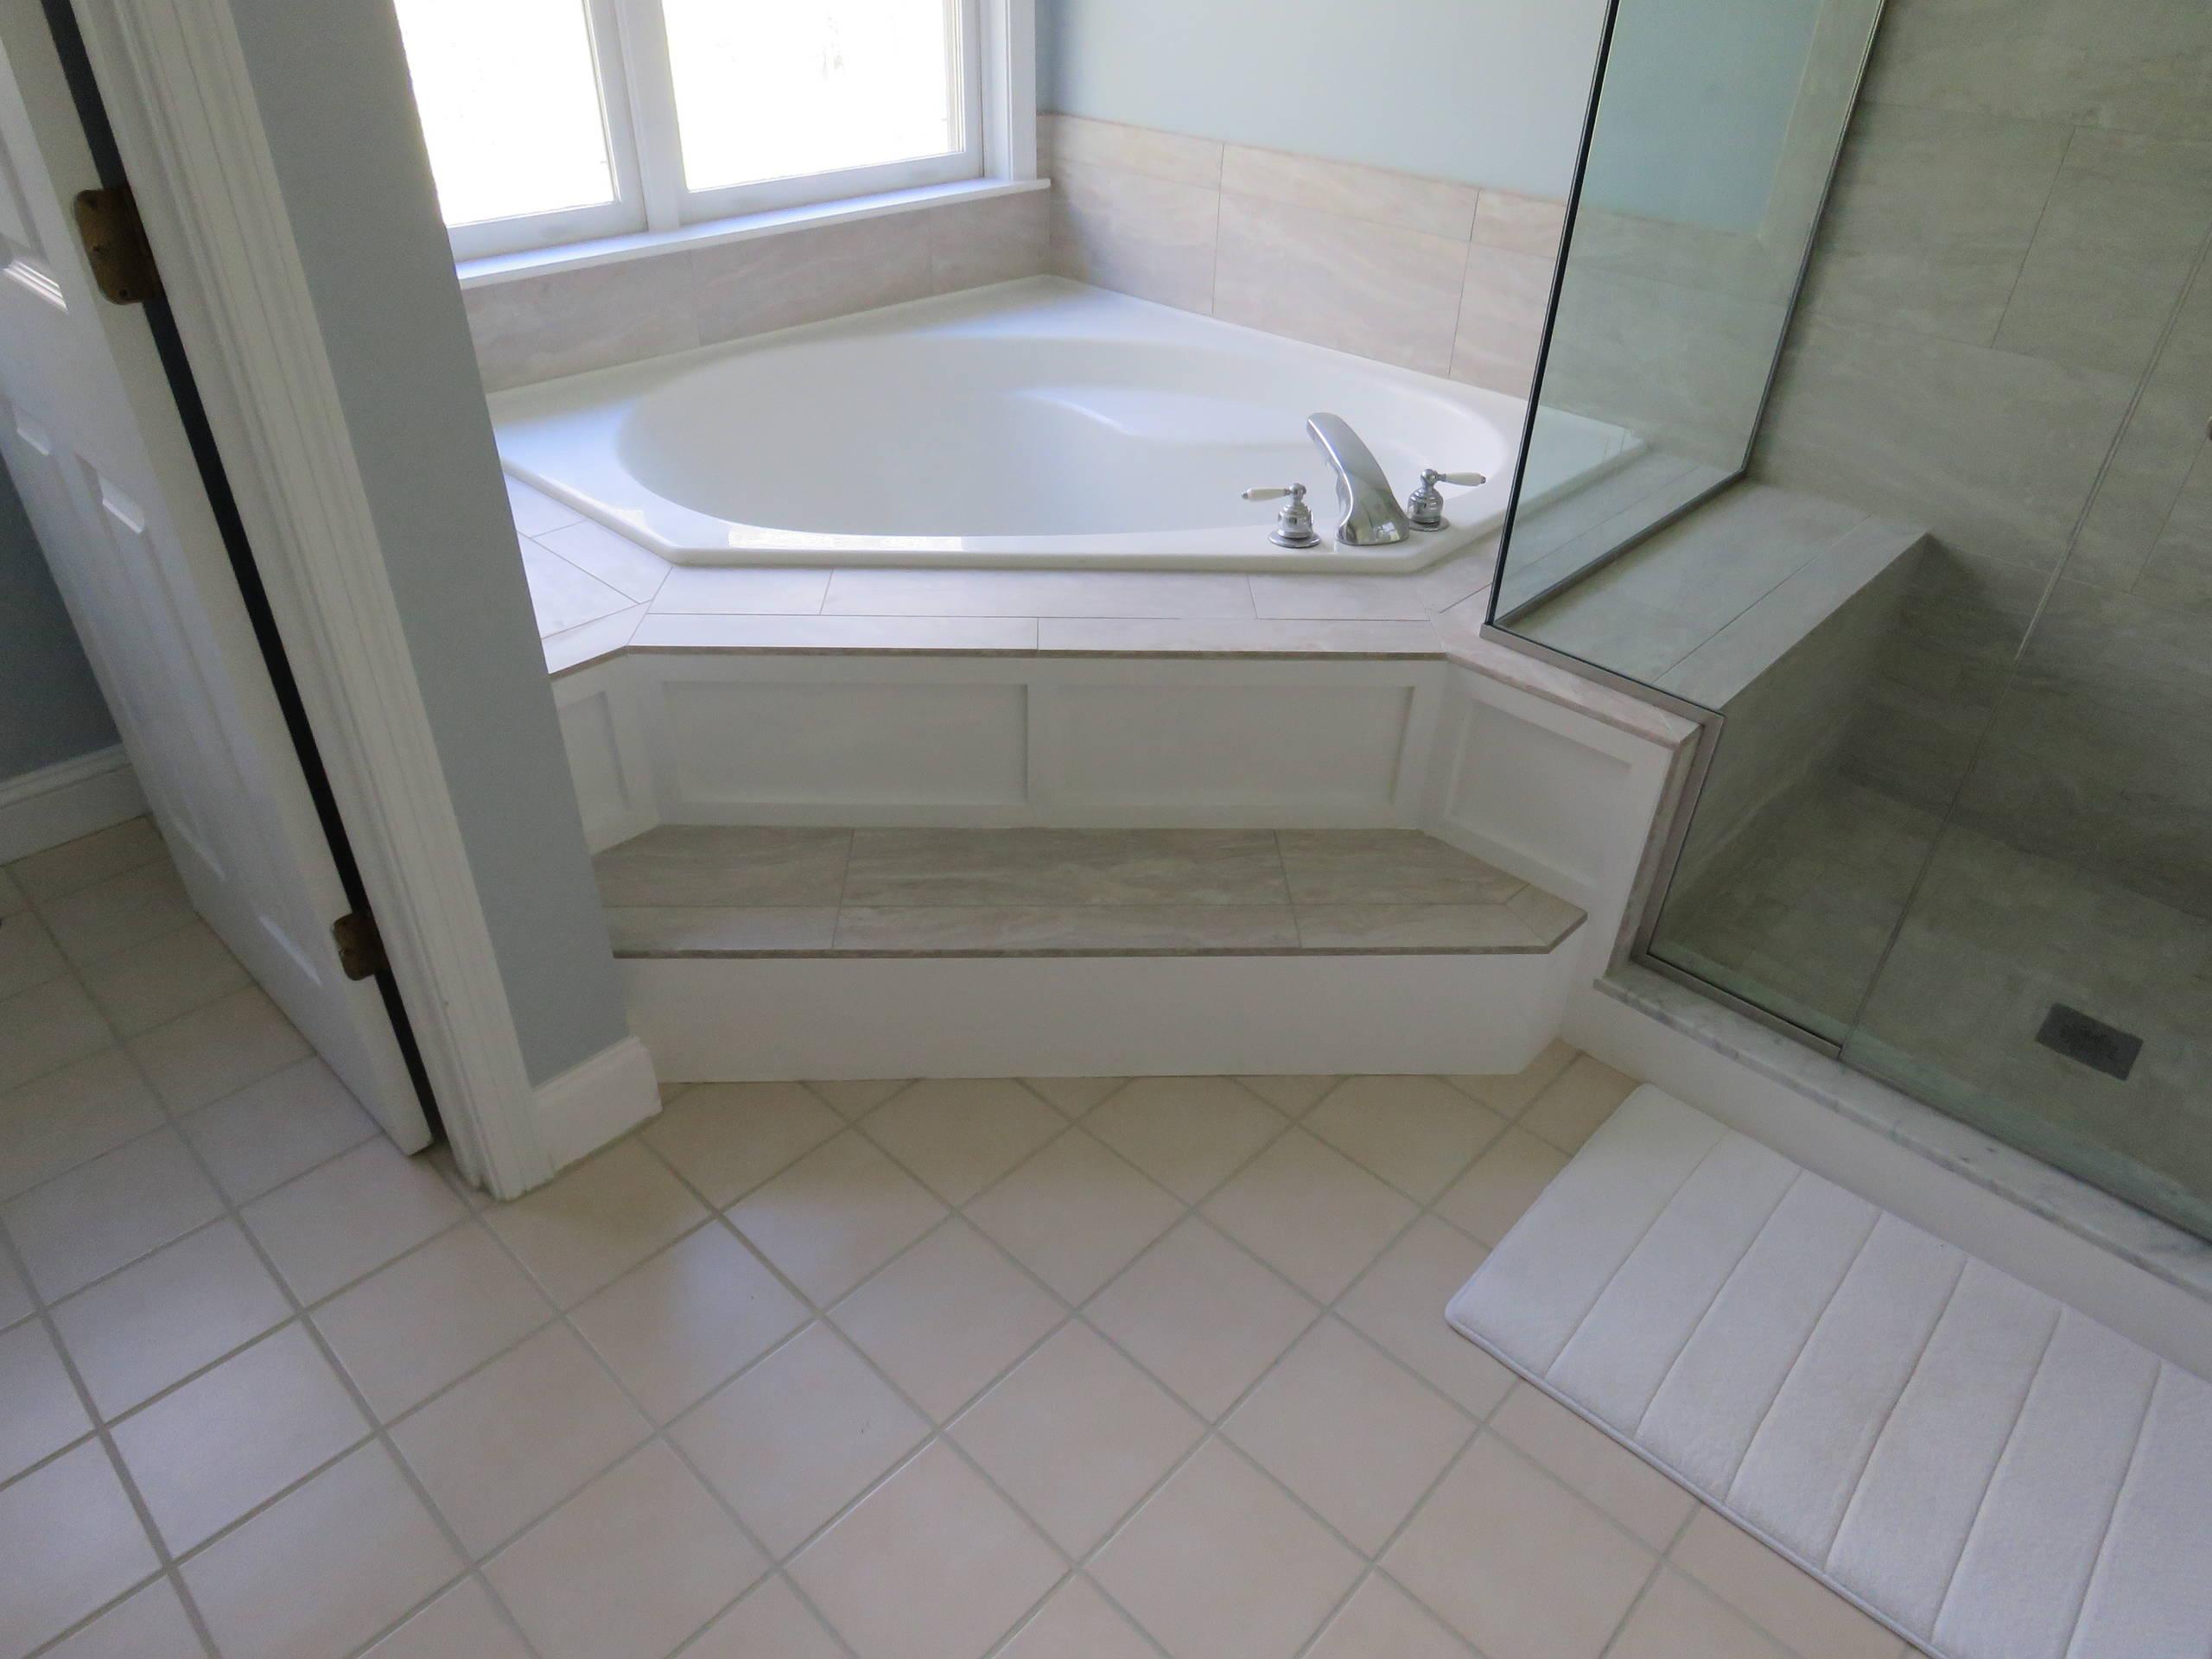 Transitional Master bath update